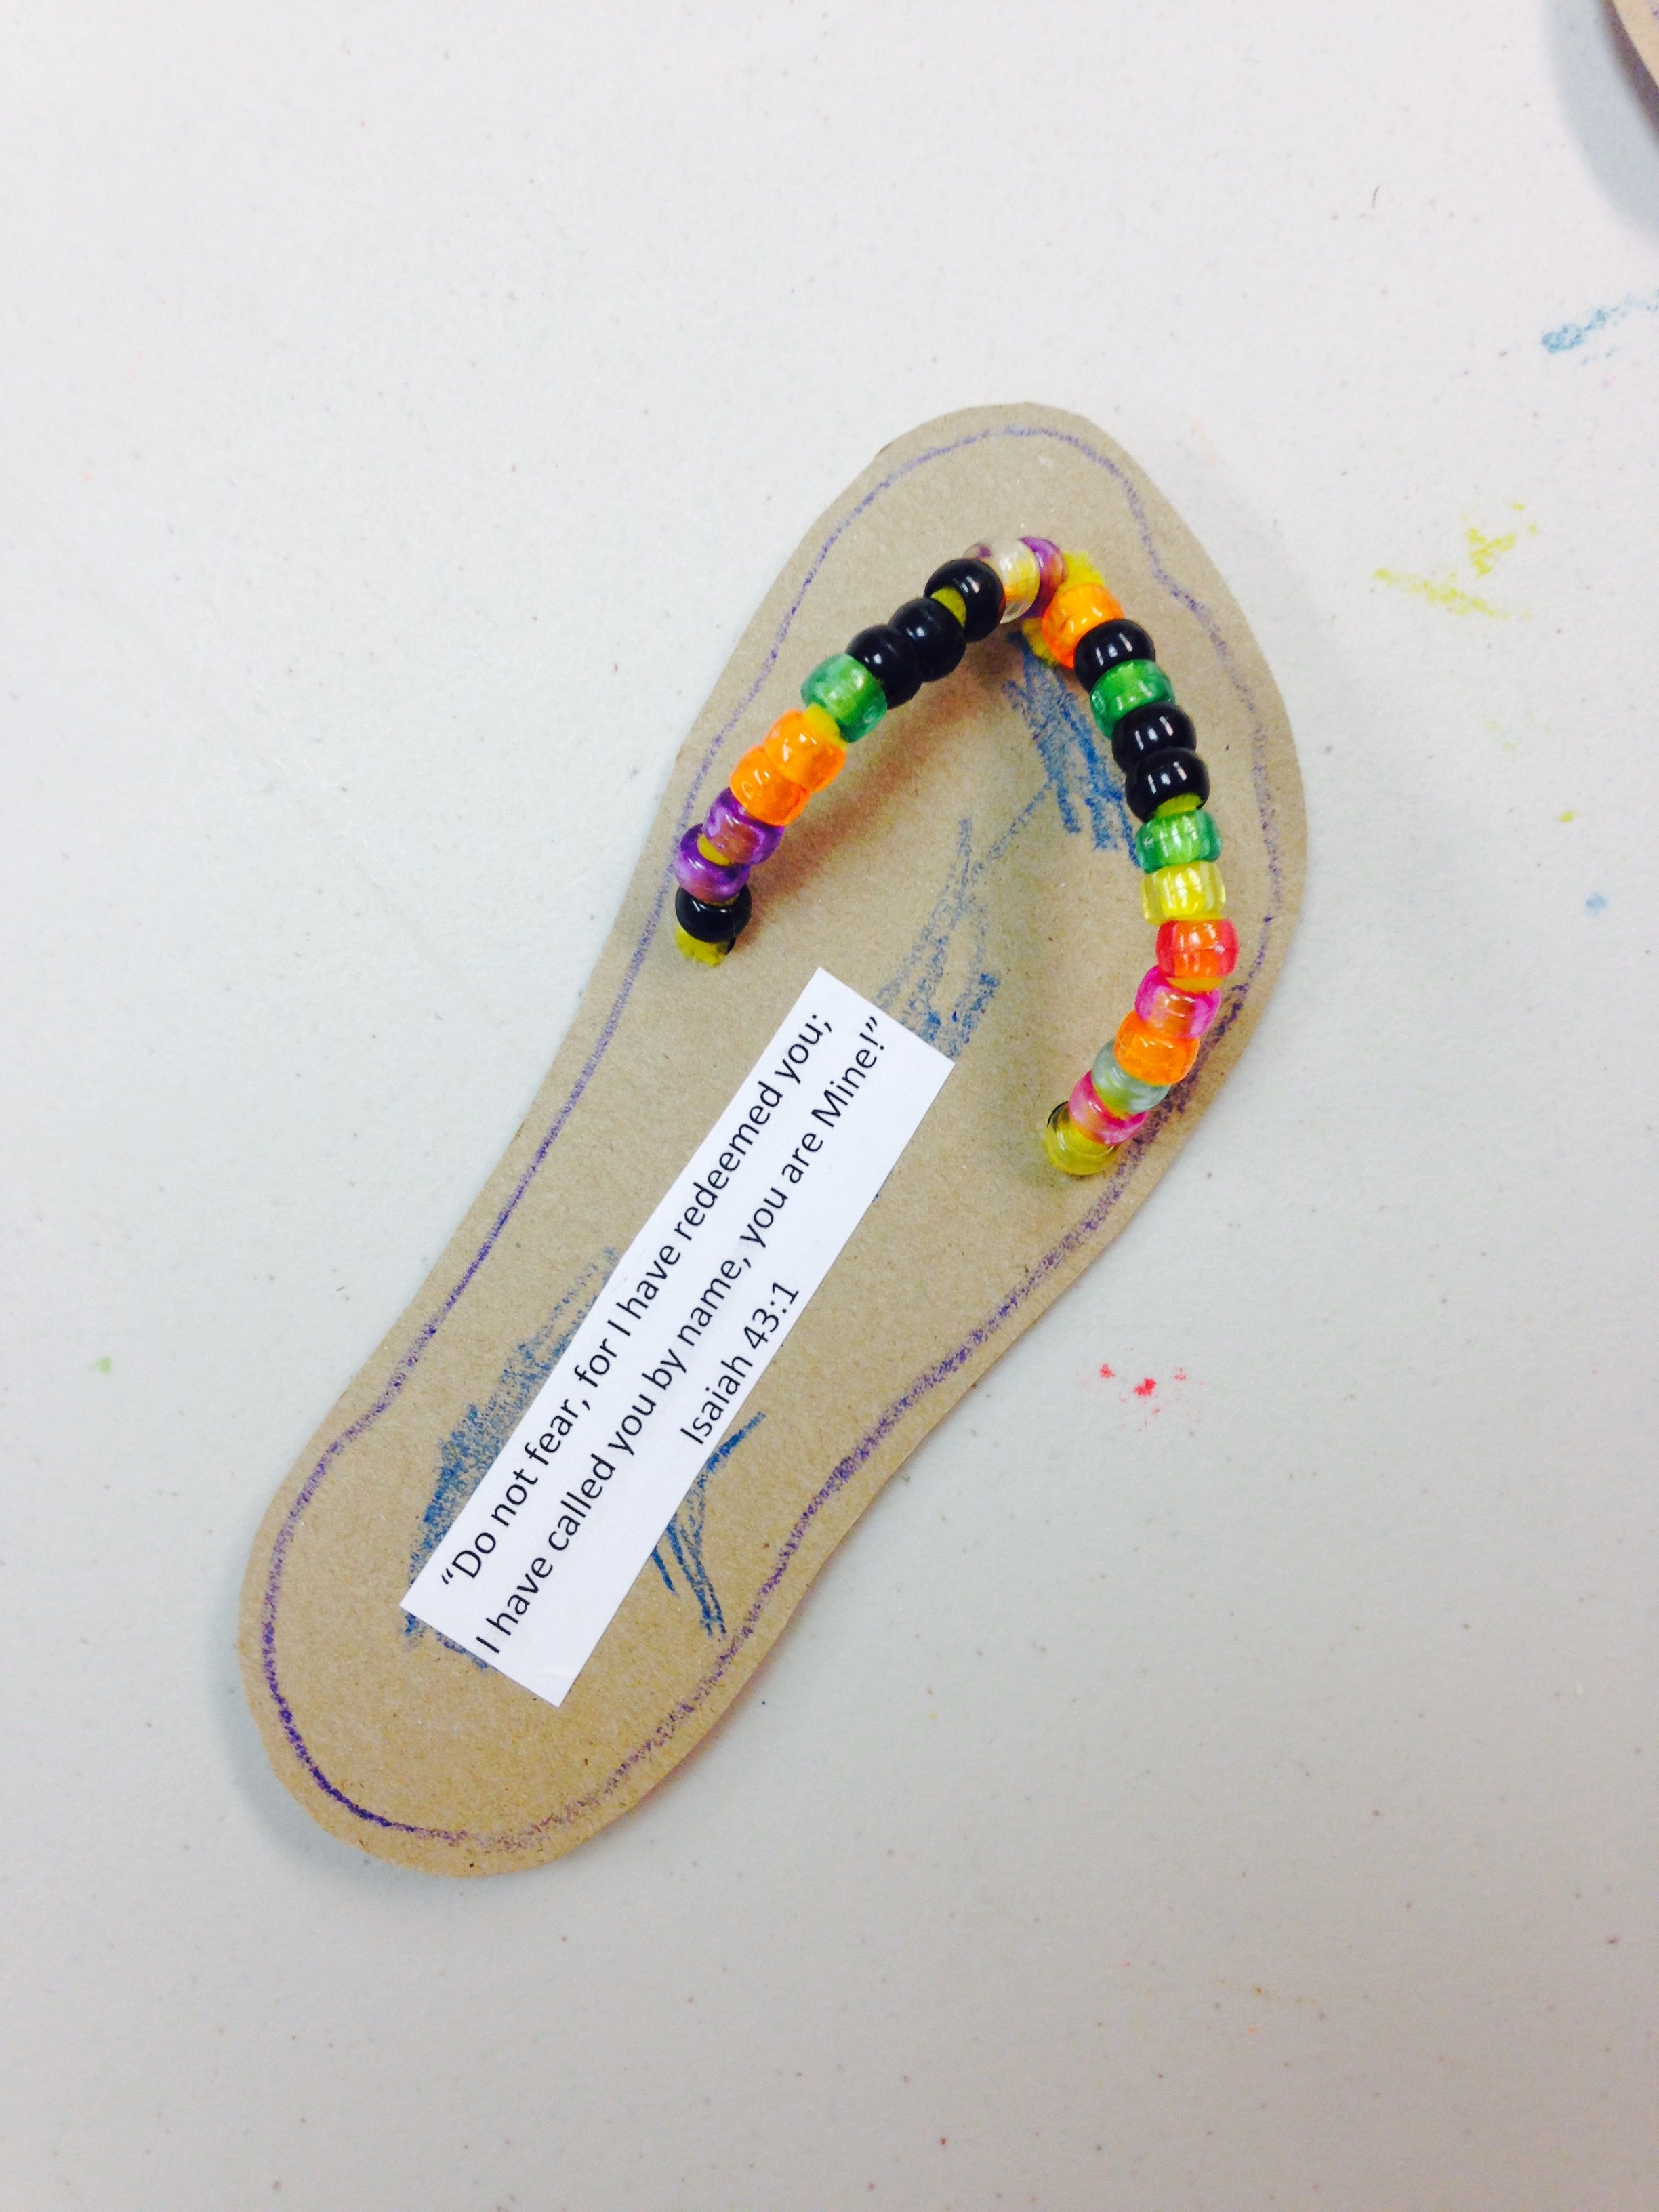 Preschool Craft For Sunday School Lesson On Boaz Redeems Ruth The Closer Kinsman Gave Boaz